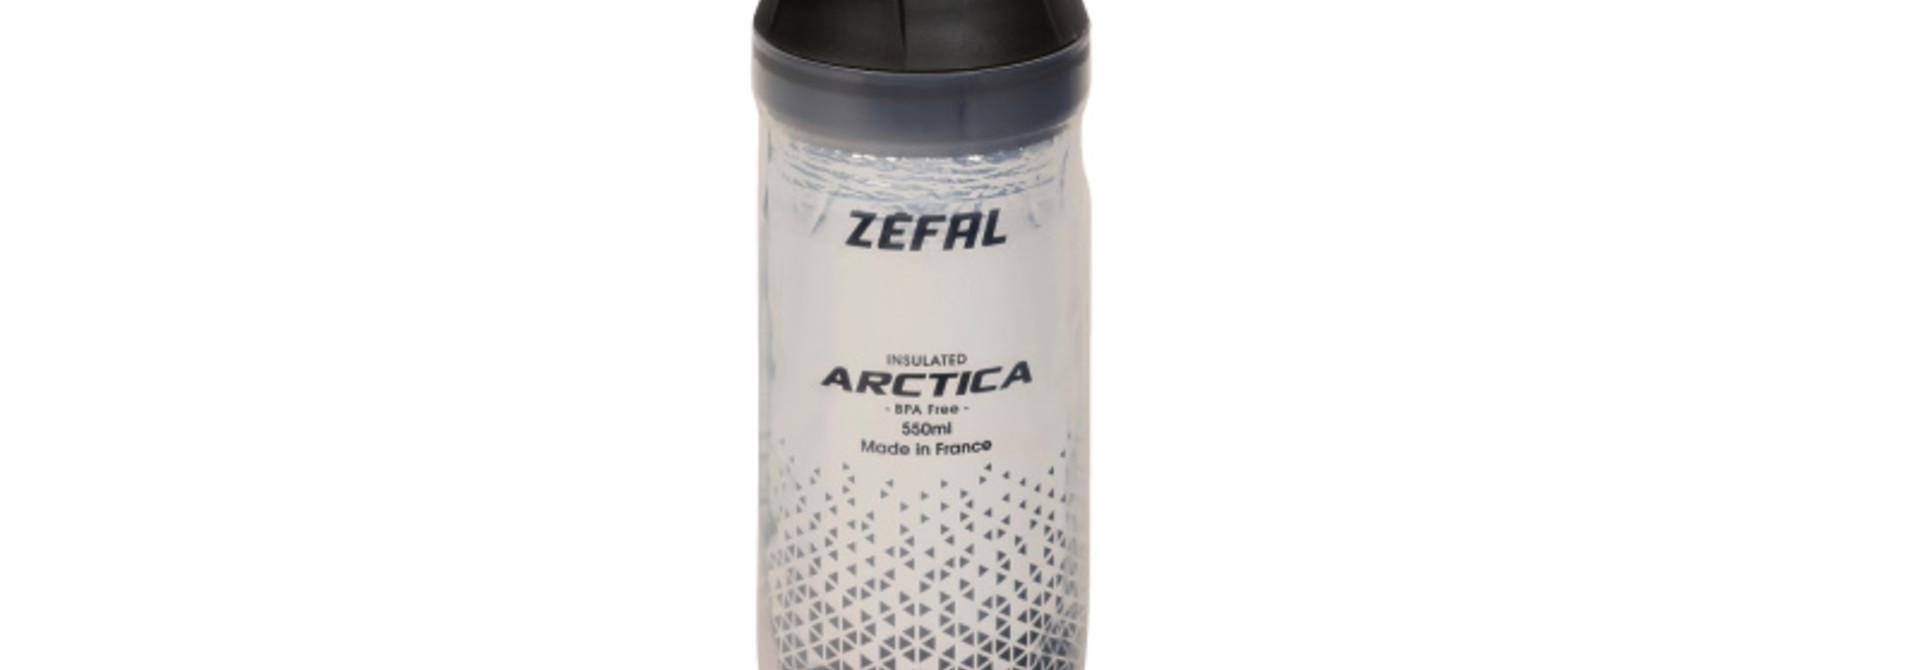 Zefal, Arctica, Insulated Bottle